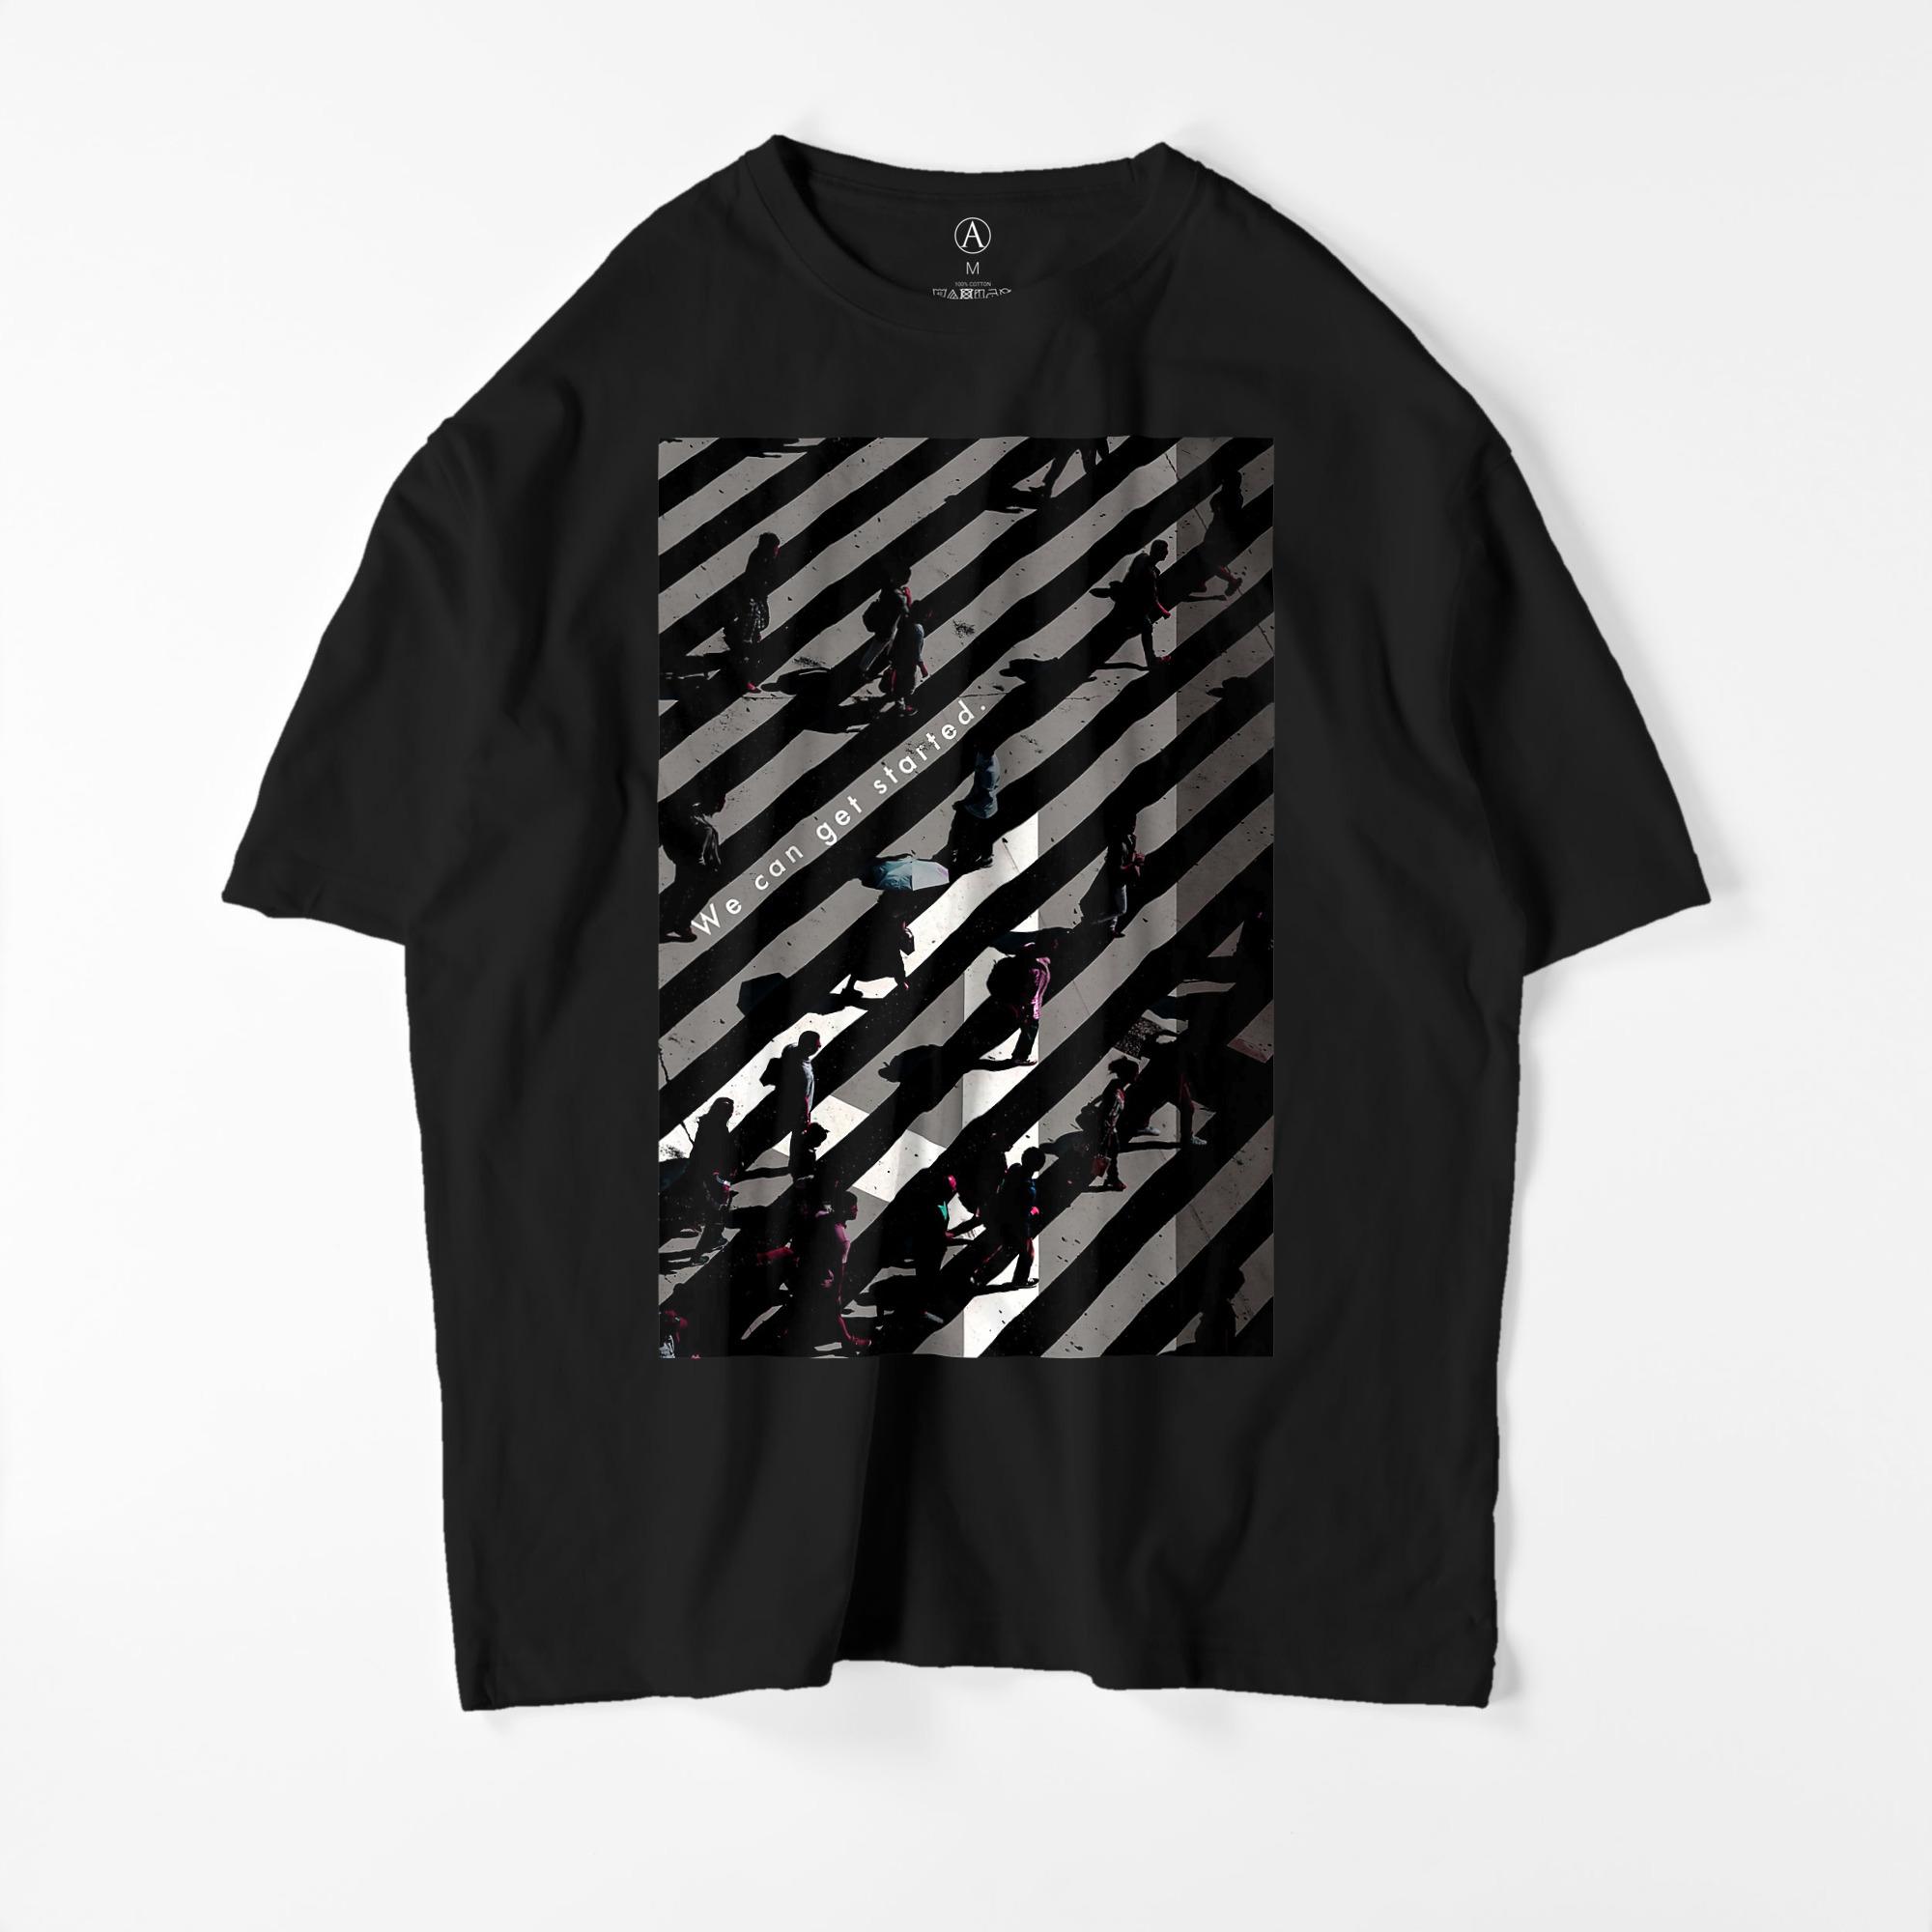 START ビッグシルエットTシャツ ブラック / Mens